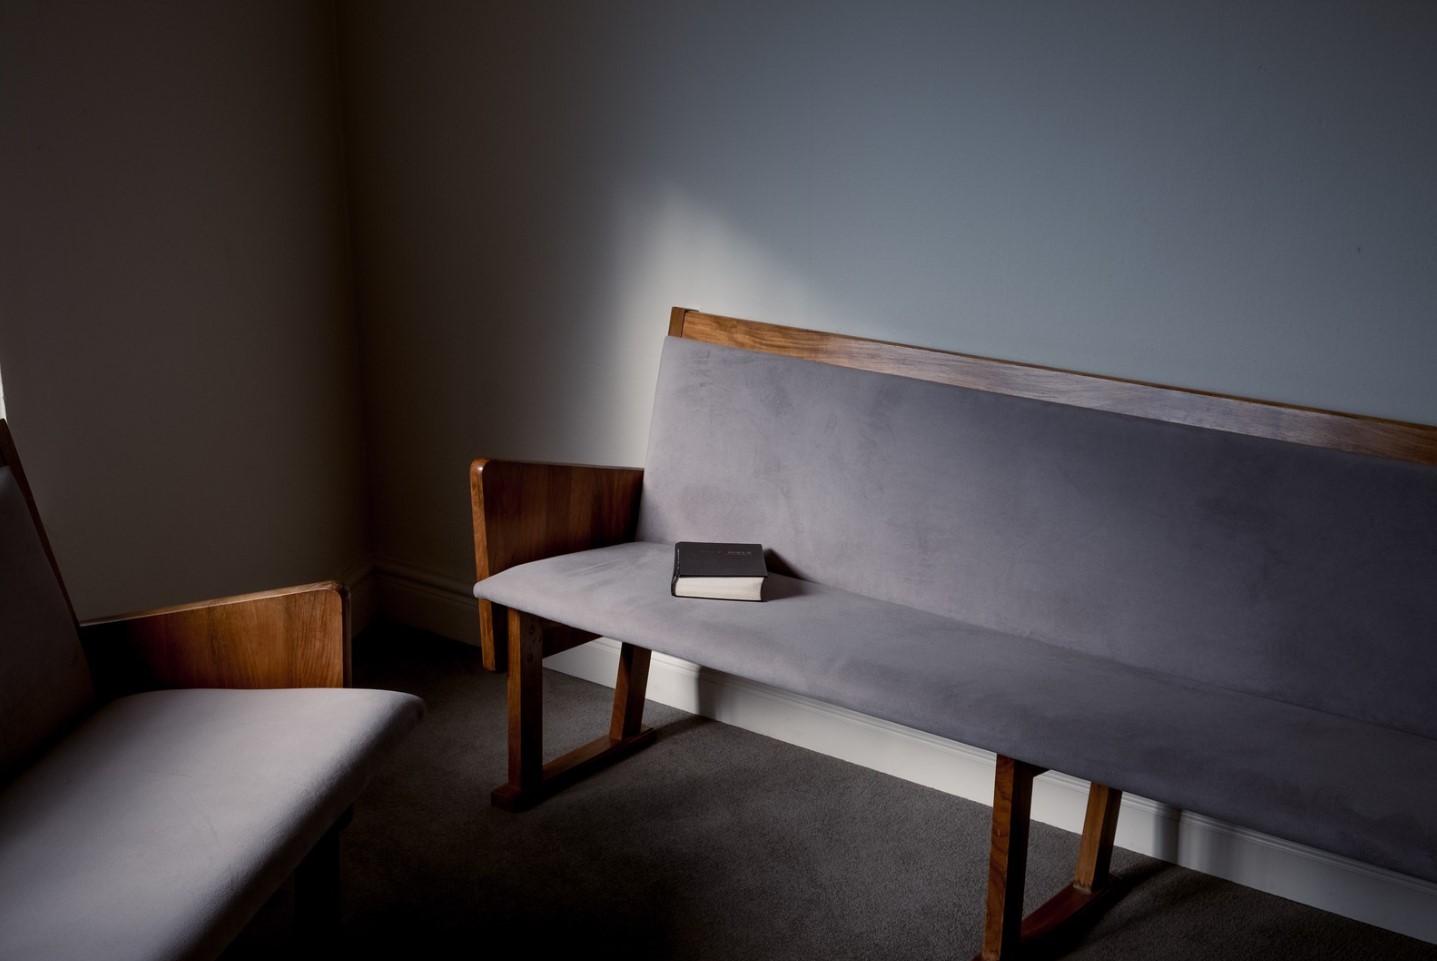 biblia sola